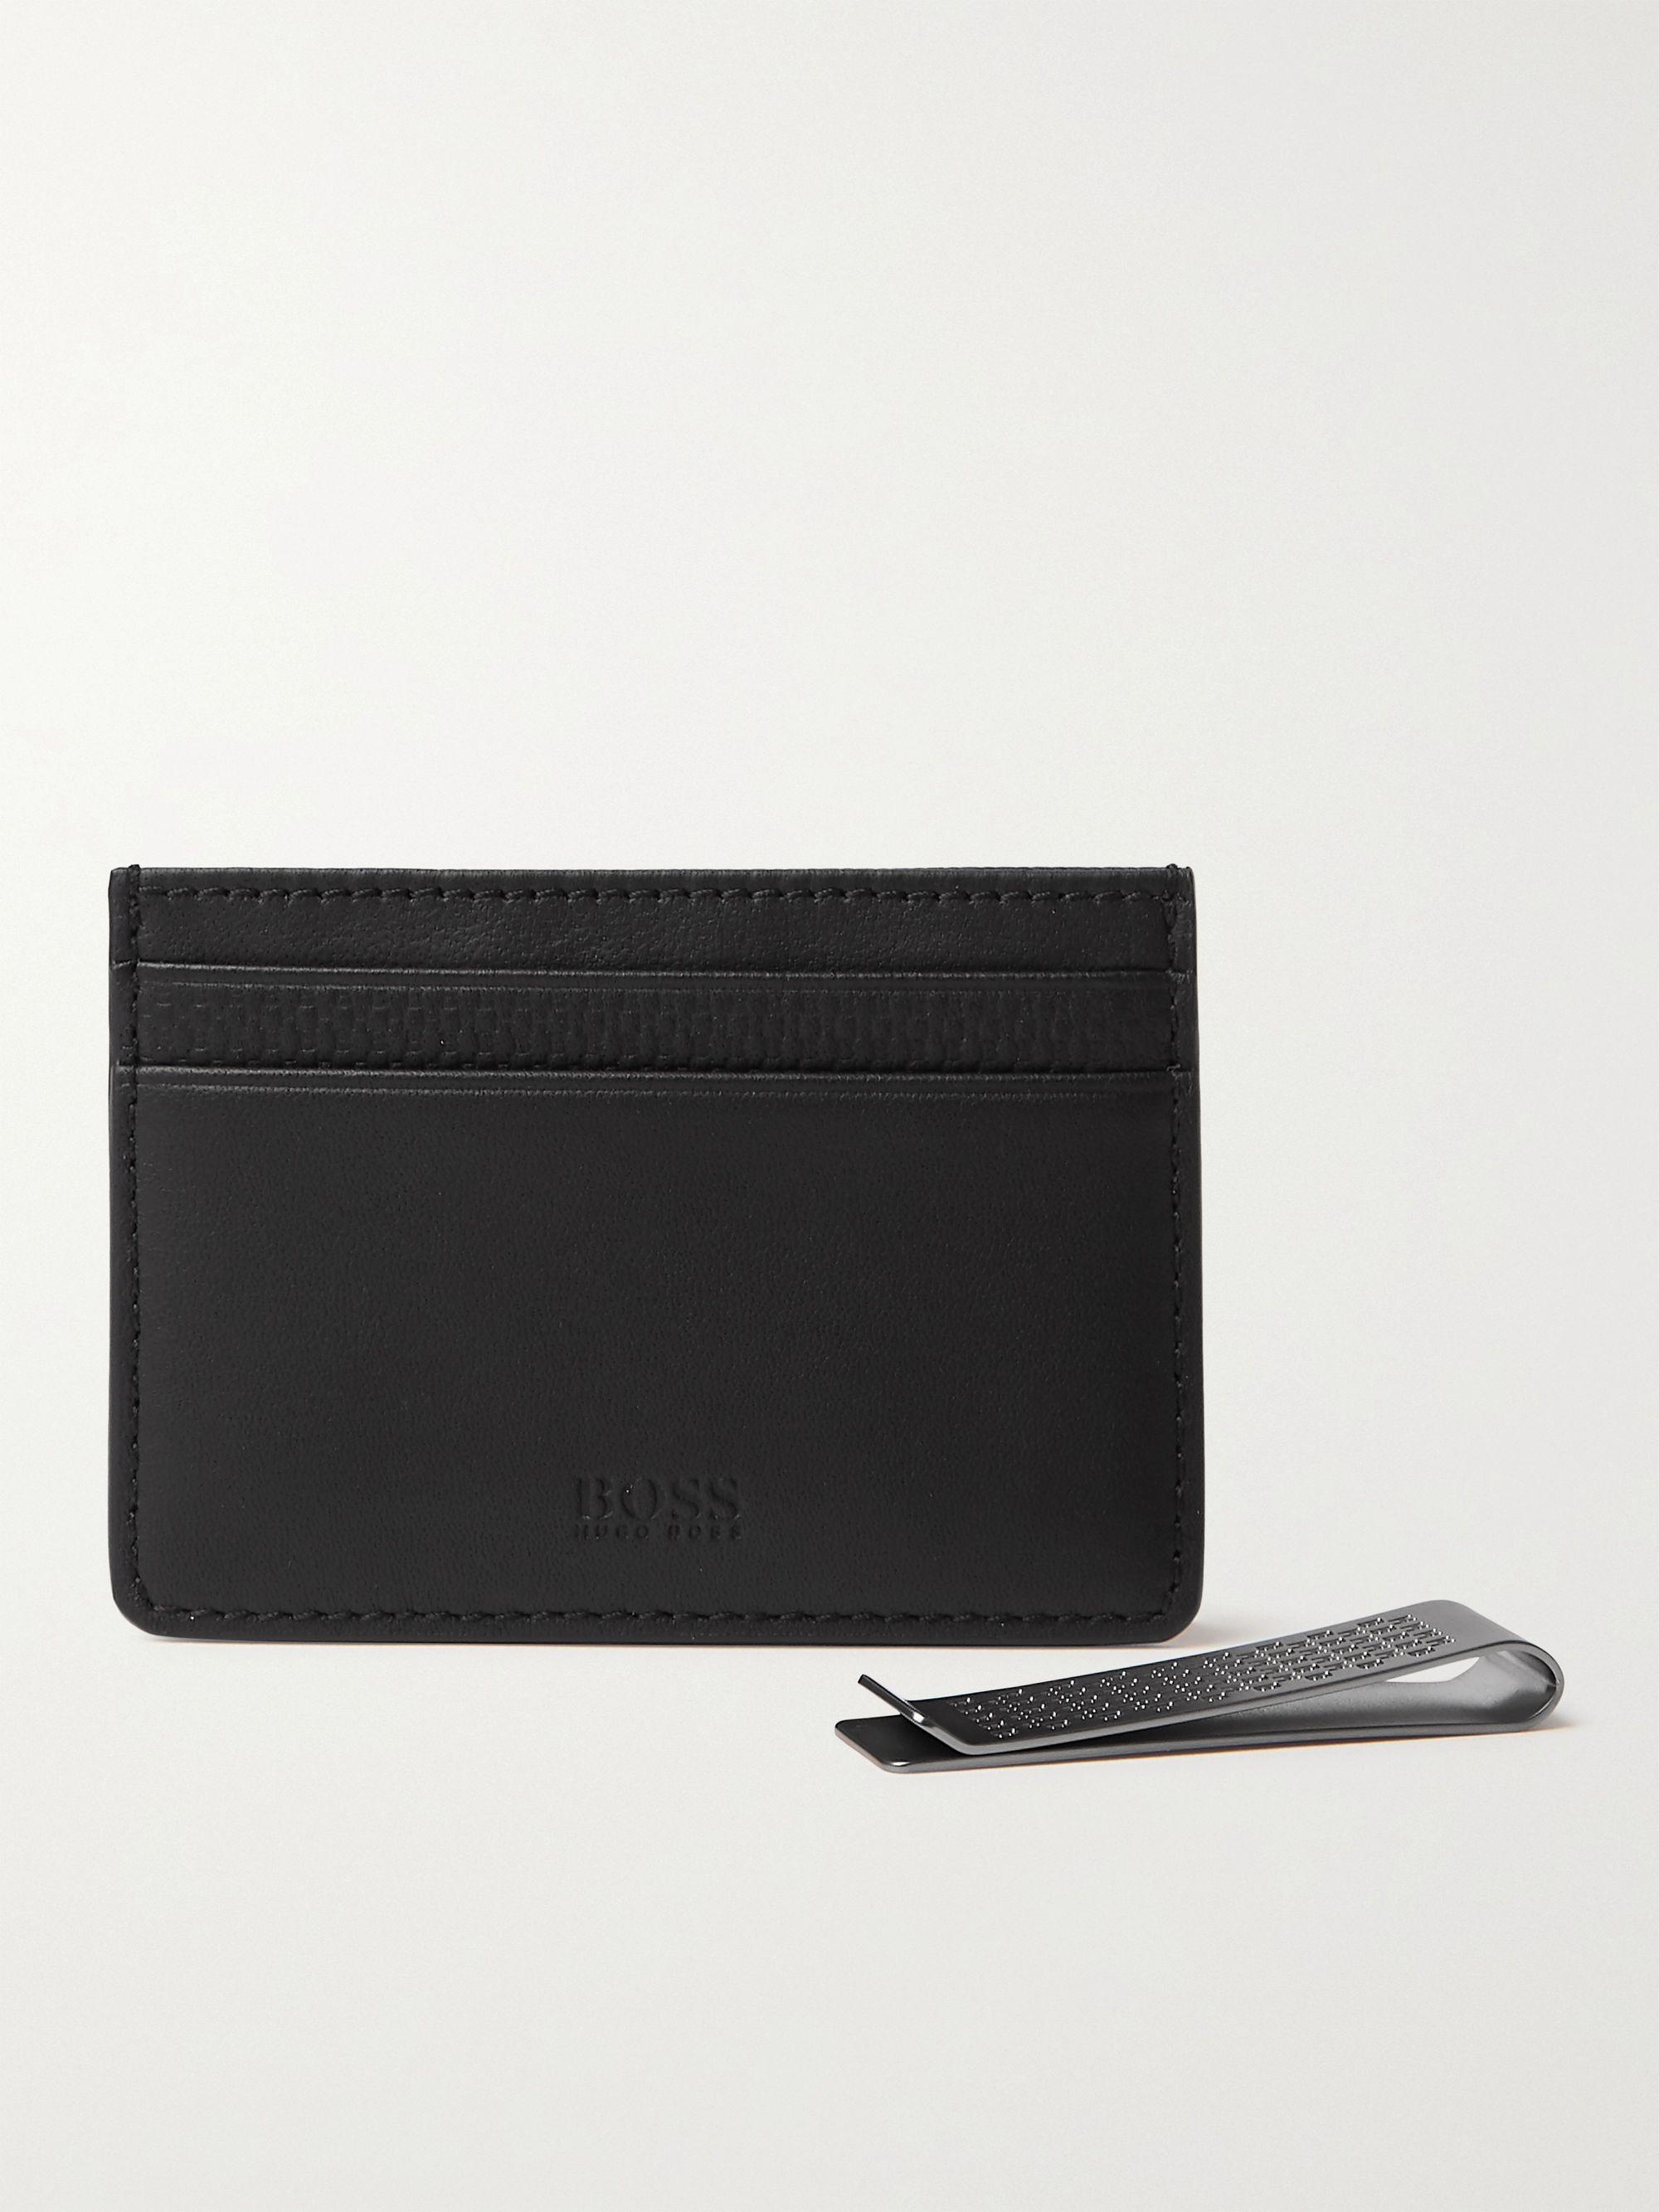 Hugo Boss Textured-Leather Cardholder and Money Clip Set,Black